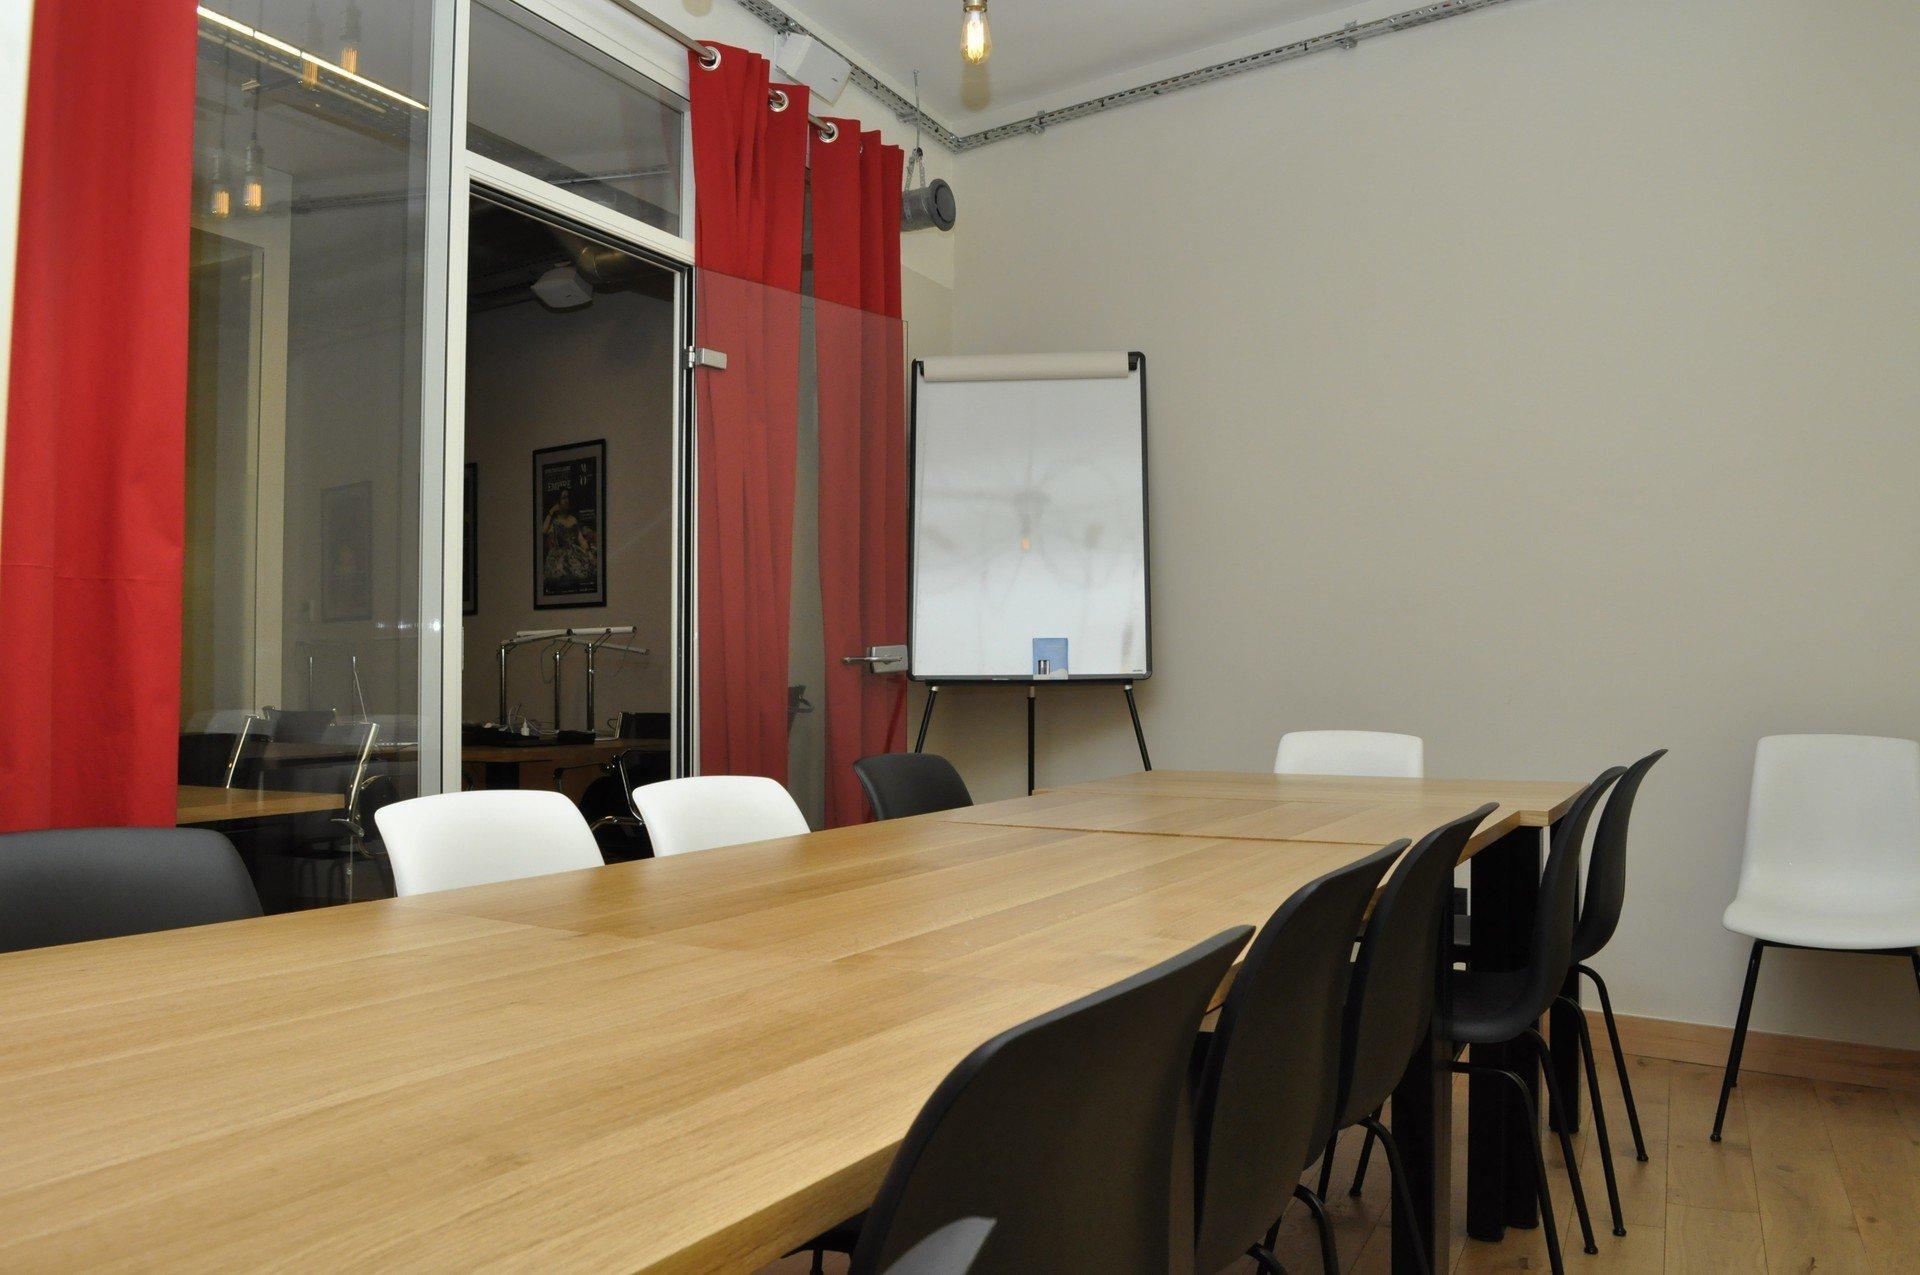 Paris Espaces de travail Coworking space Eat Two Work - meeting room 14pax image 1